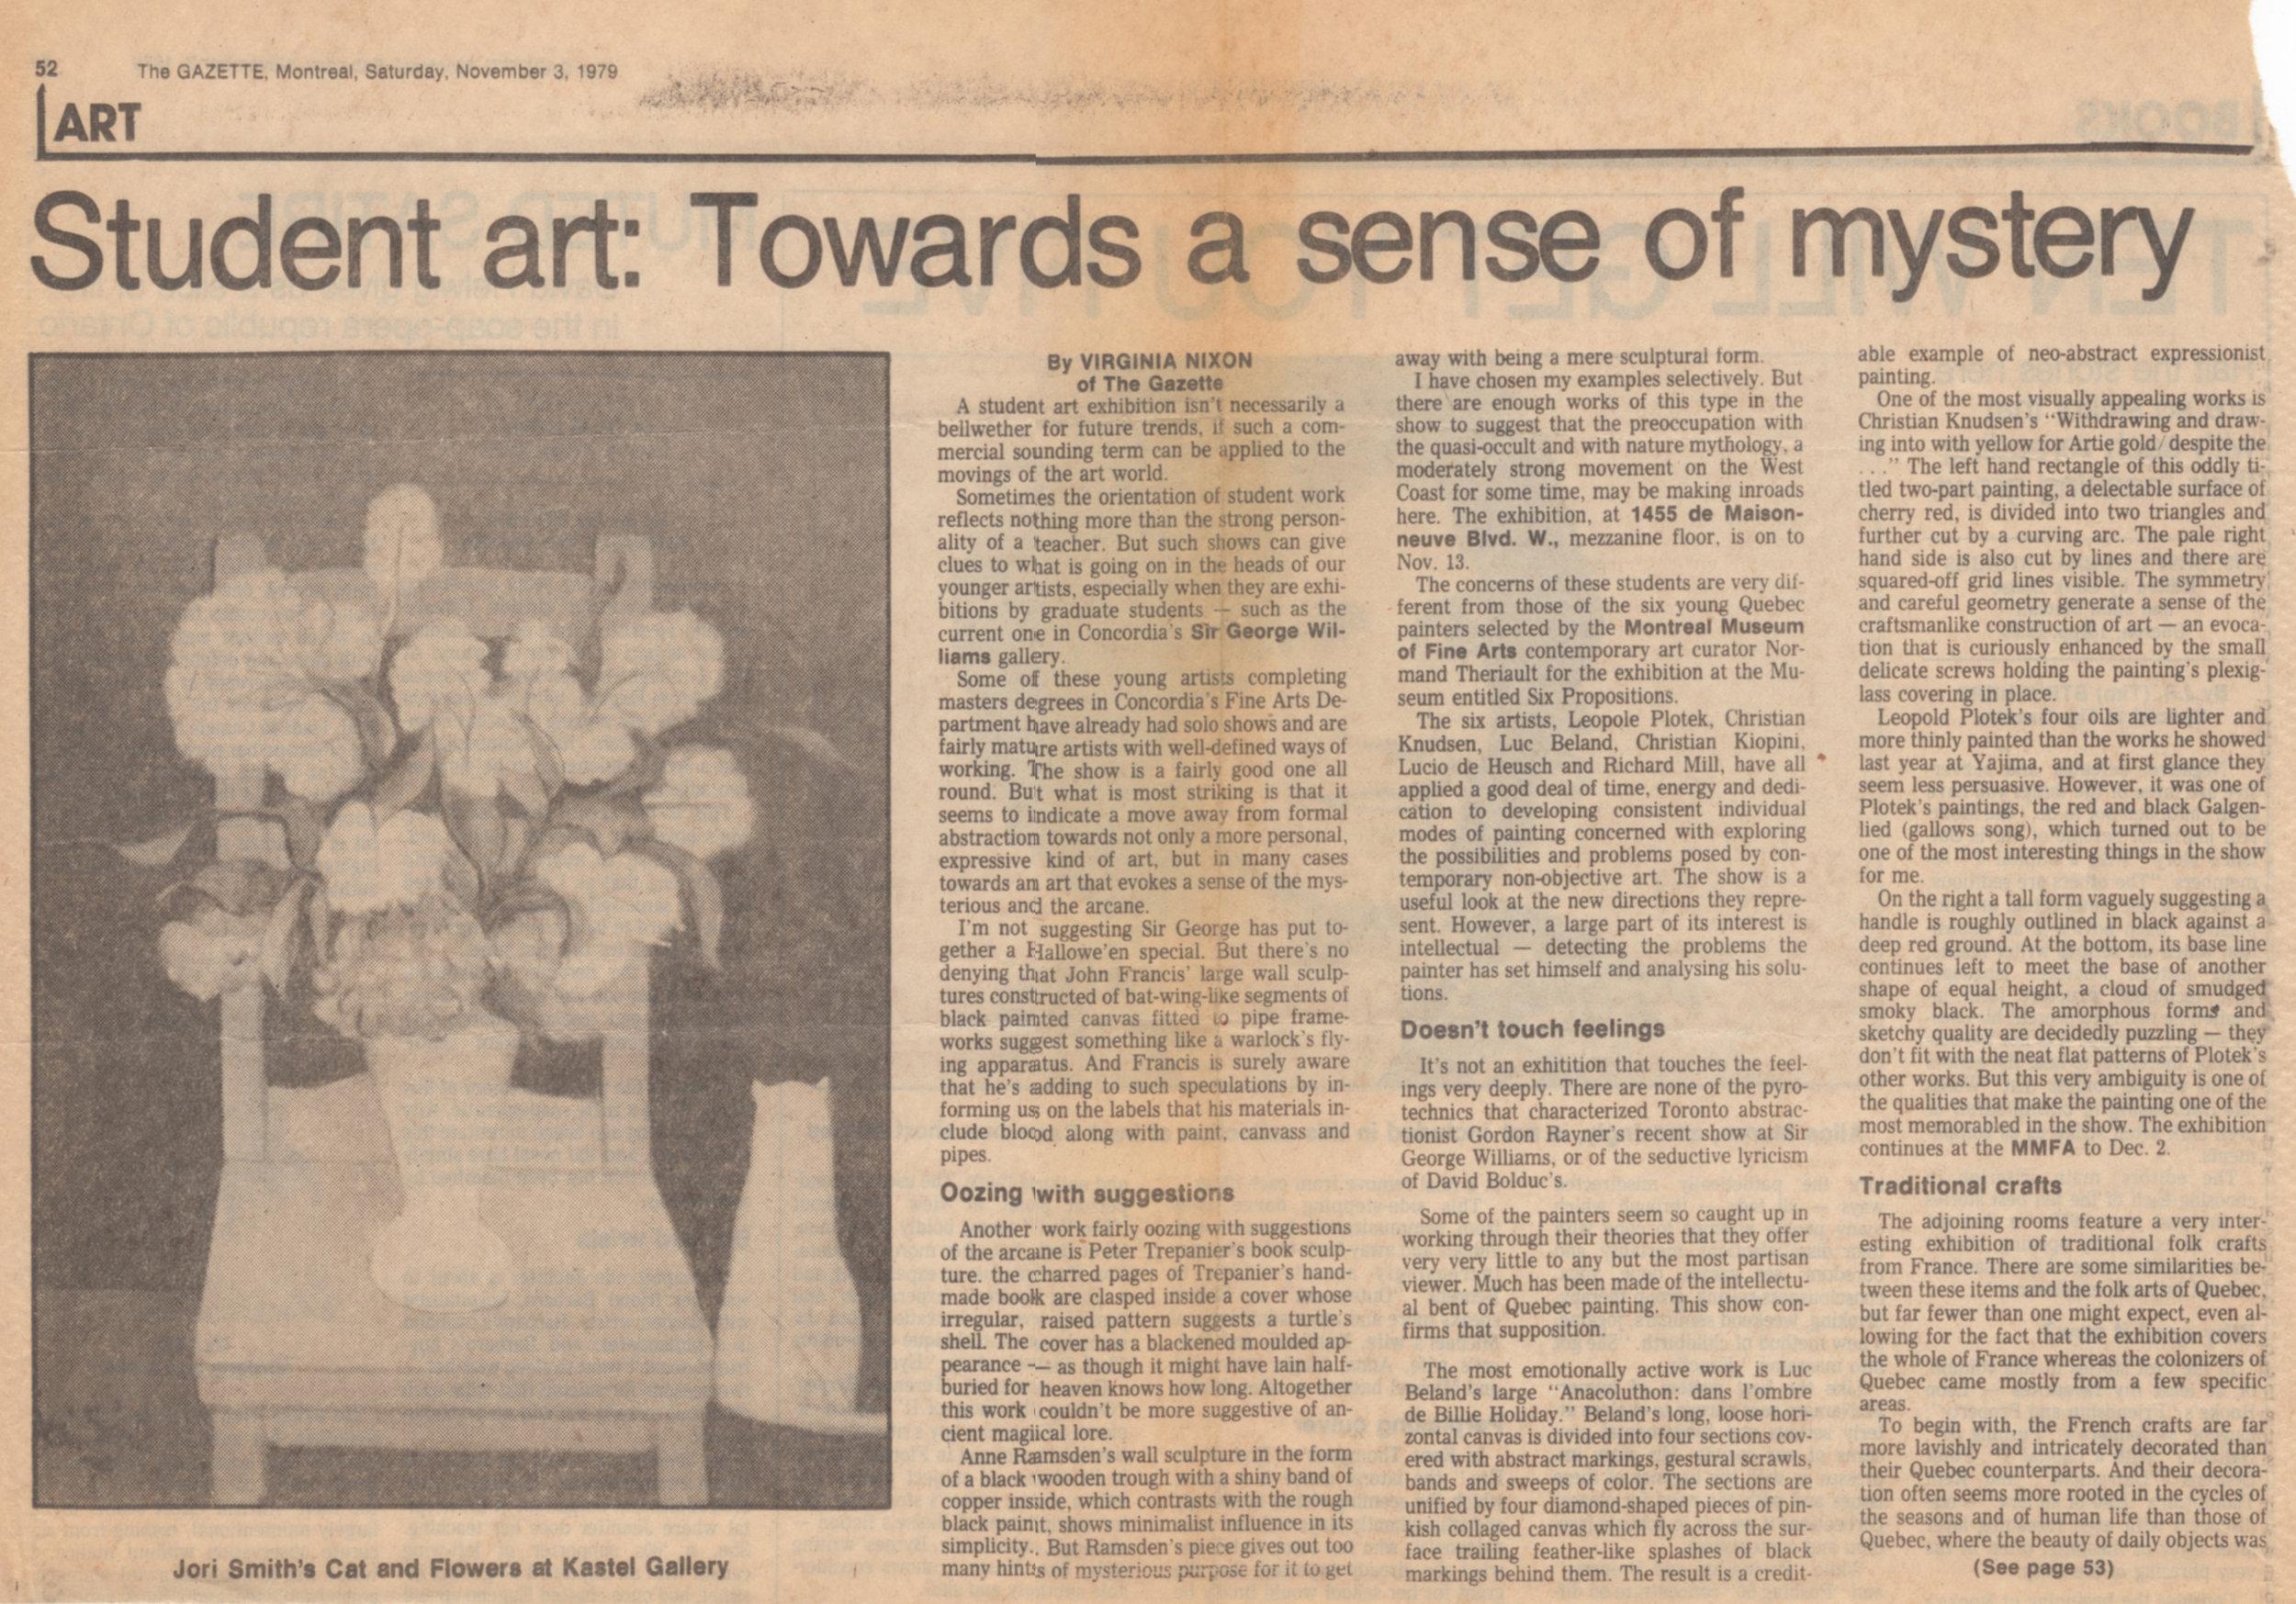 The Montreal Gazette Saturday, November 3, 1979